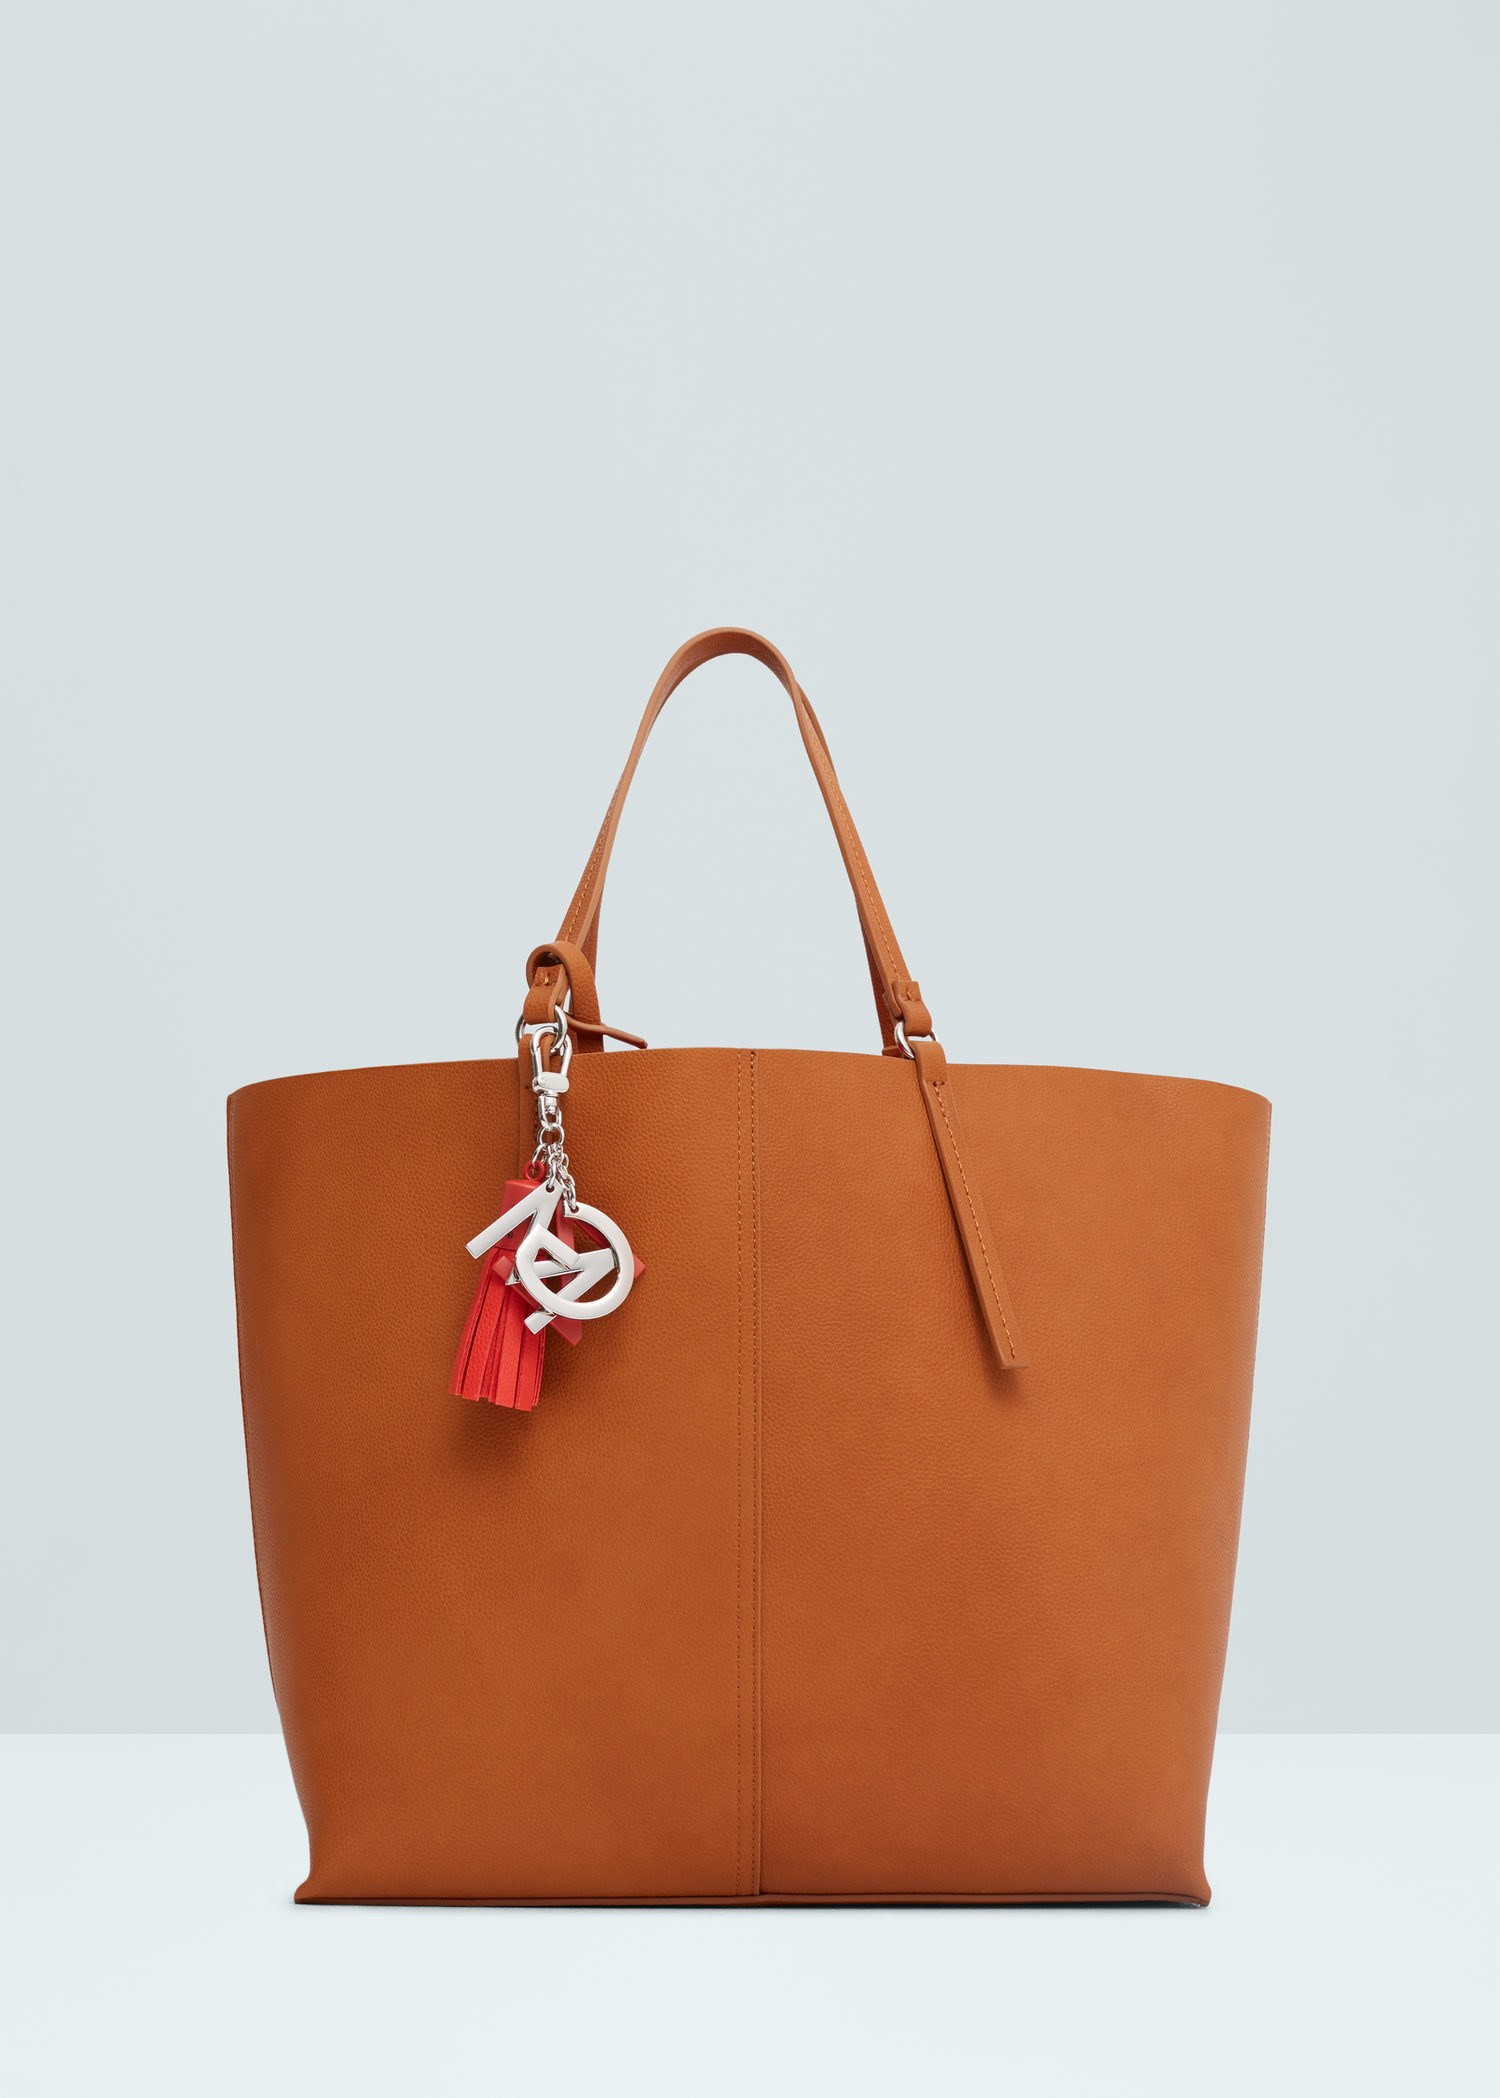 Beautiful Women Messenger Bag MANGO Plaid Bucket Women Leather Handbags Item Specifics Iscustomized Yes Exterior Open Pocket Size Medium3050cm Interior Interior Compartment Closure Type Zipper Handbags Type